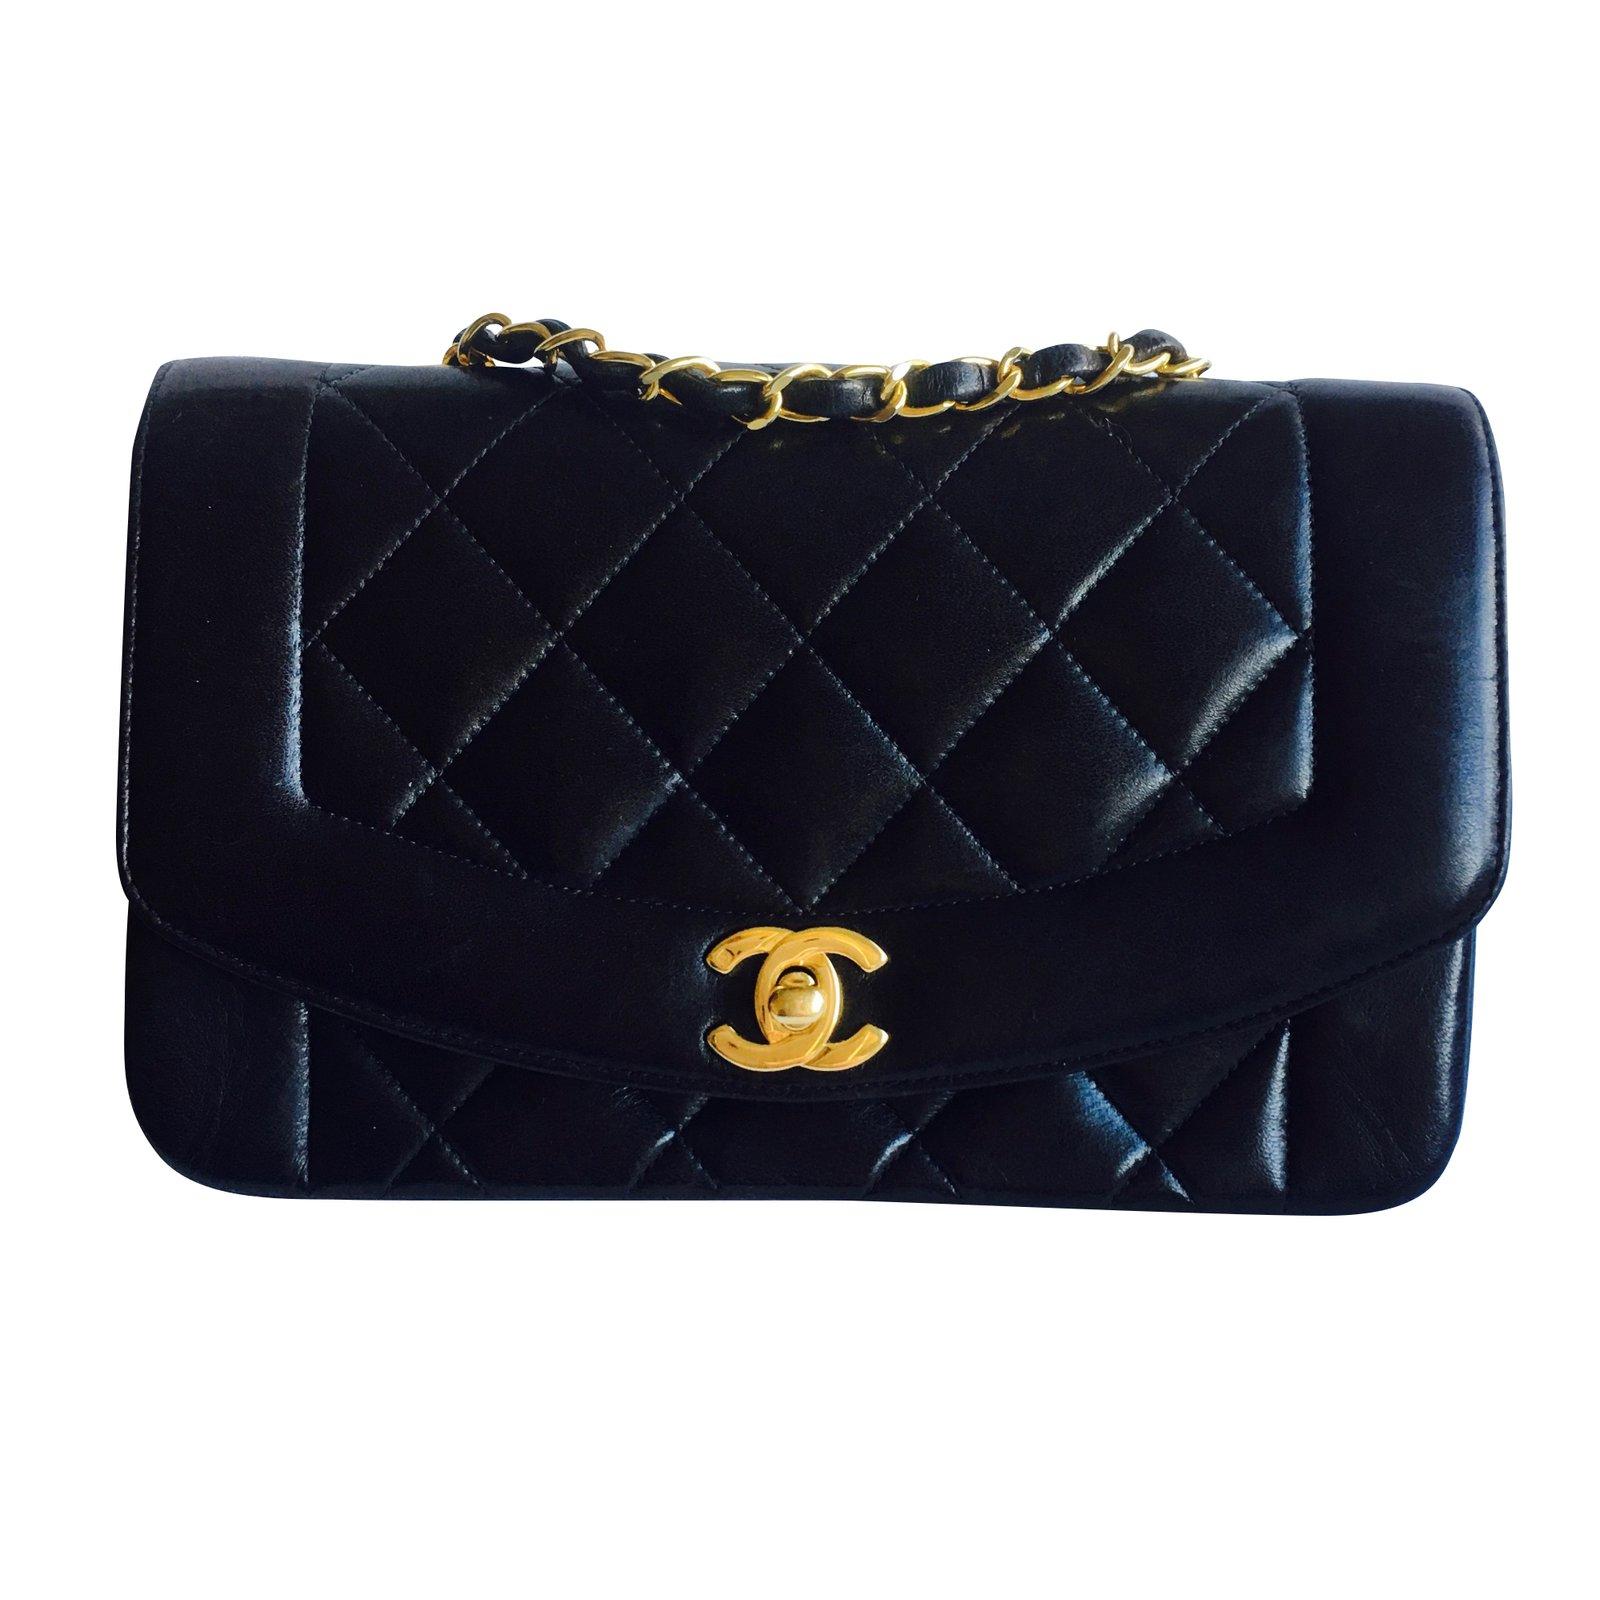 7bb3a18bb86 Sacs à main Chanel Beau sac CHANEL Timeless Vintage (Diana) Cuir Noir ref.